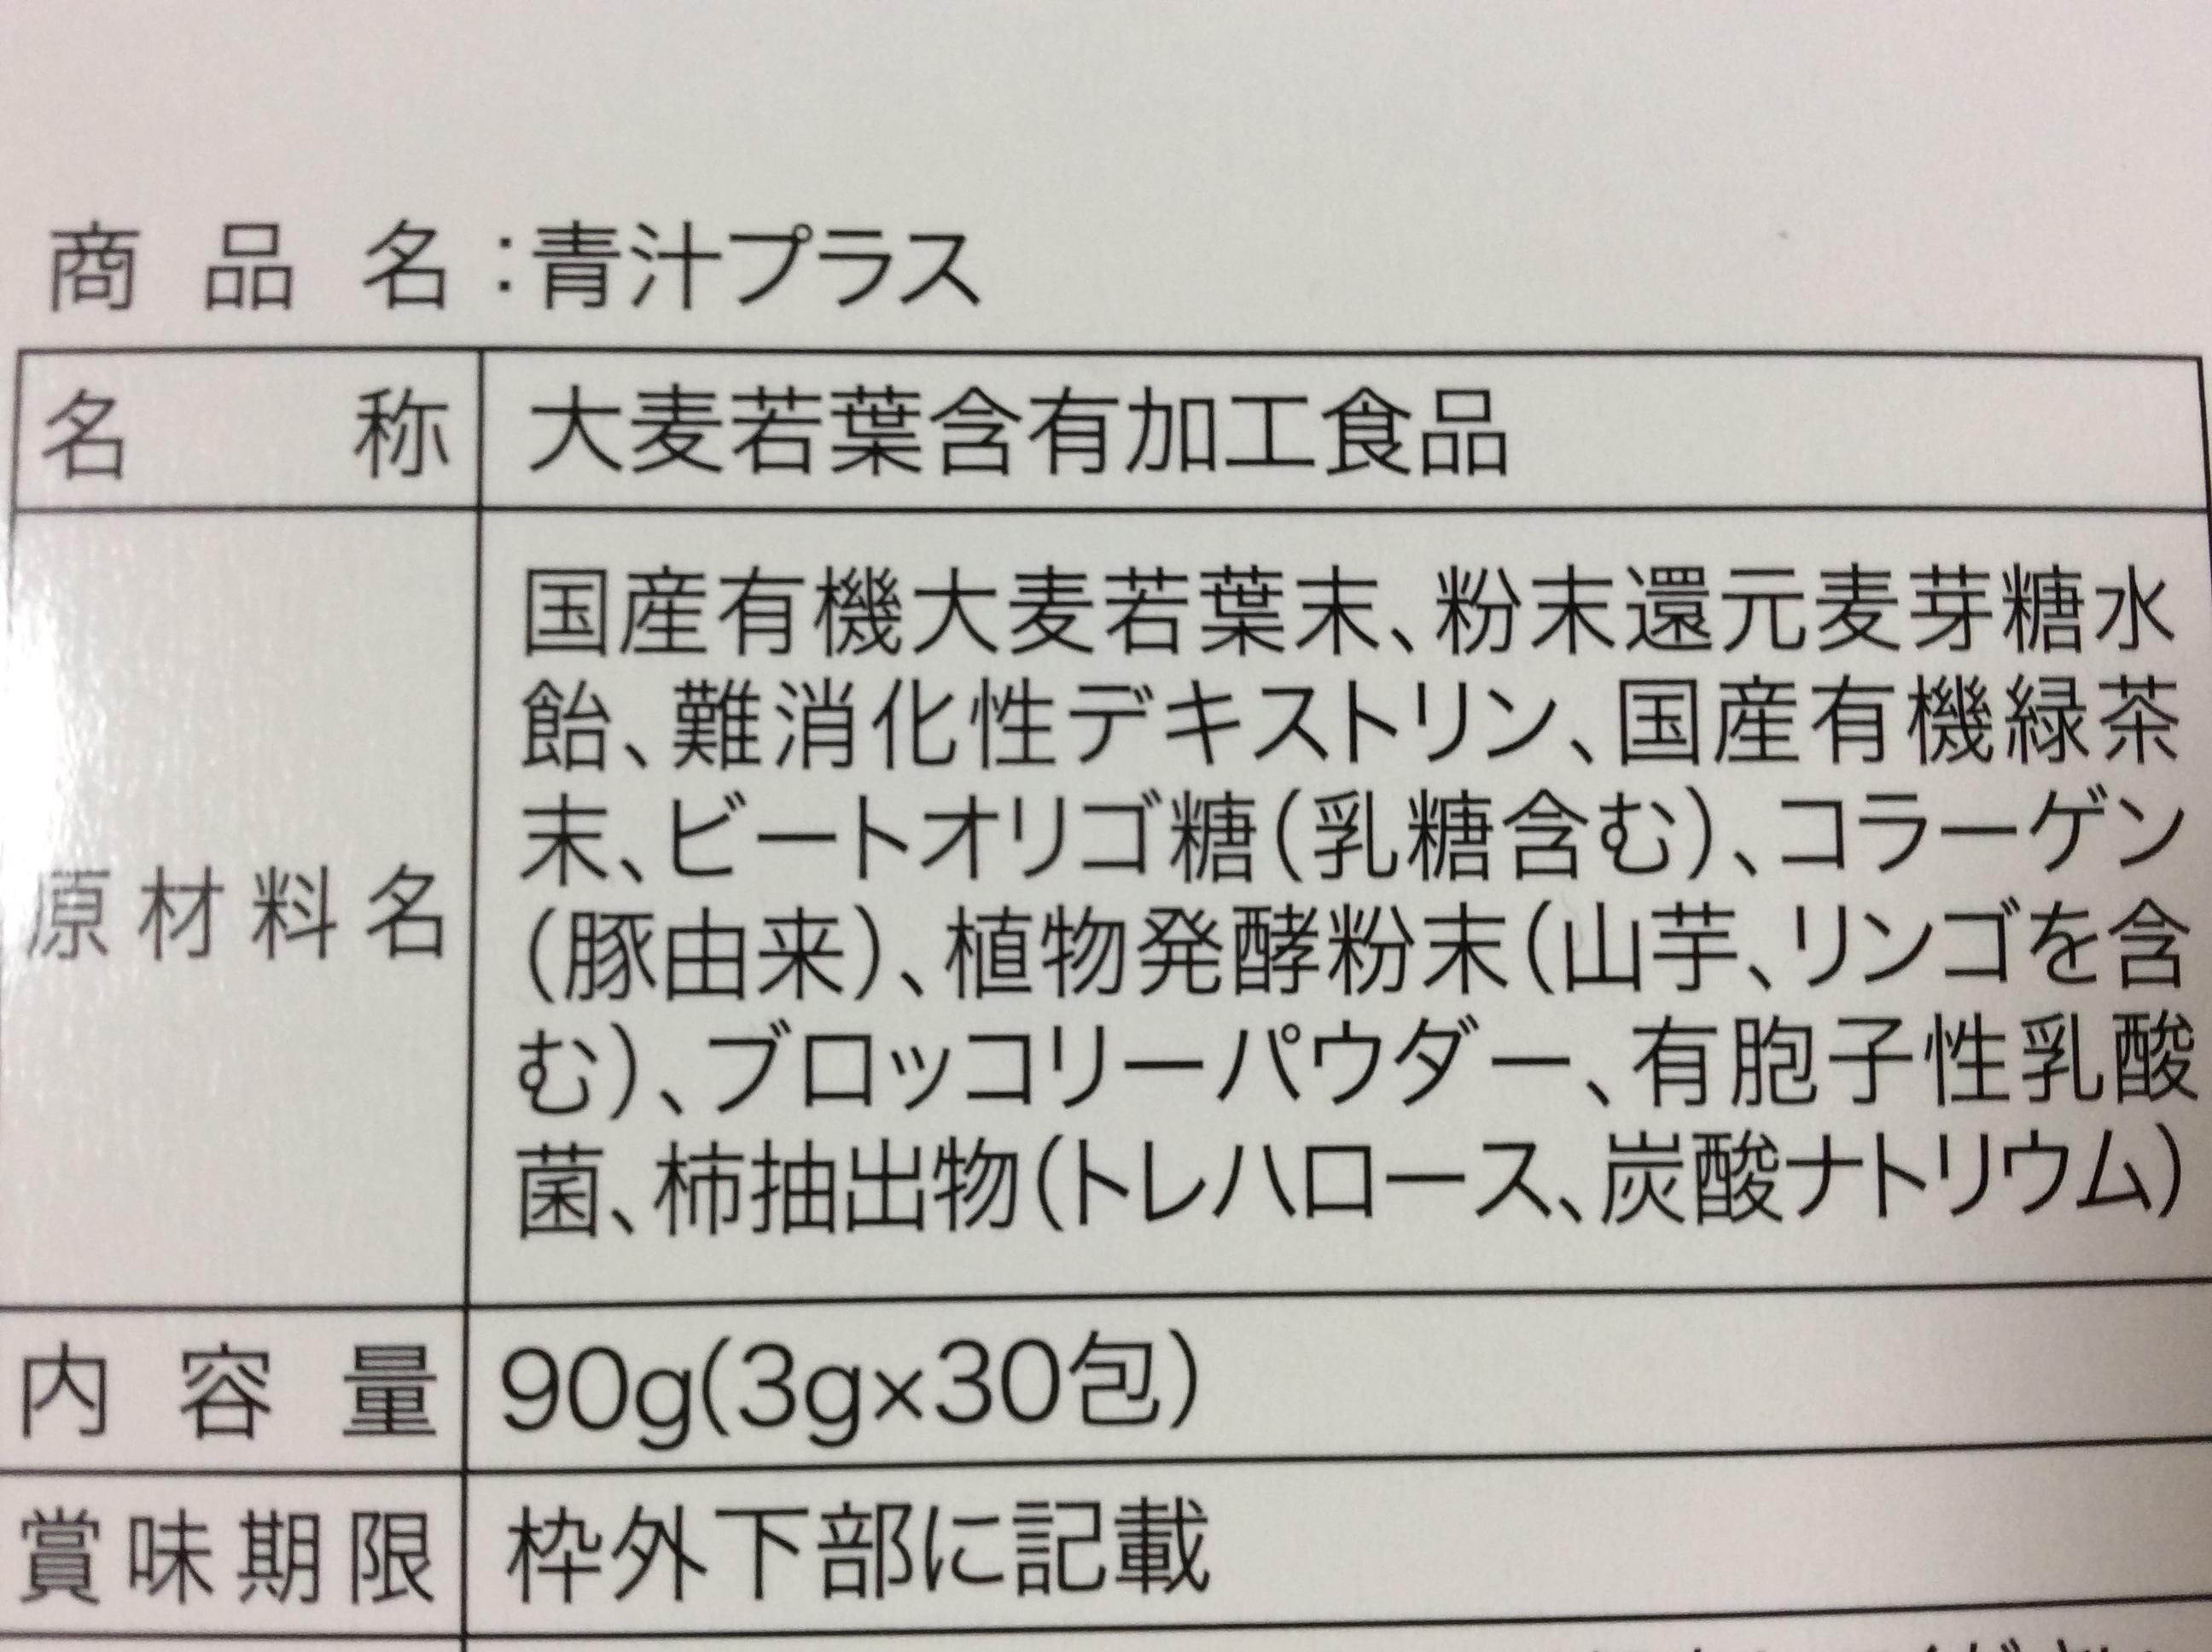 9C15ABF1-C74E-4FD8-881F-6C9C95777942.jpeg